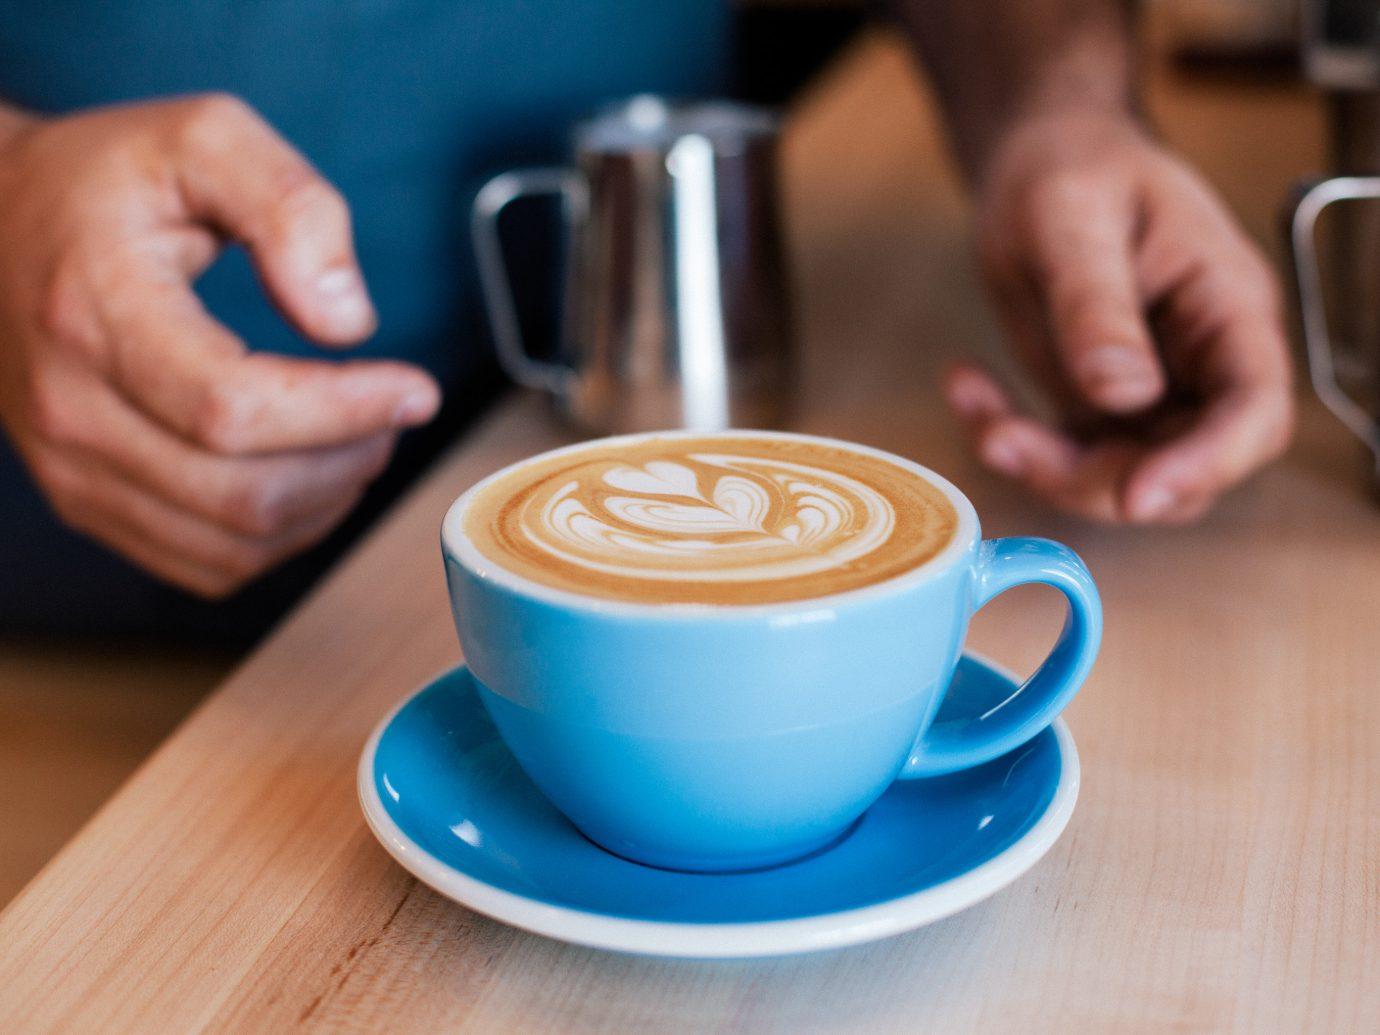 Fleet Coffee